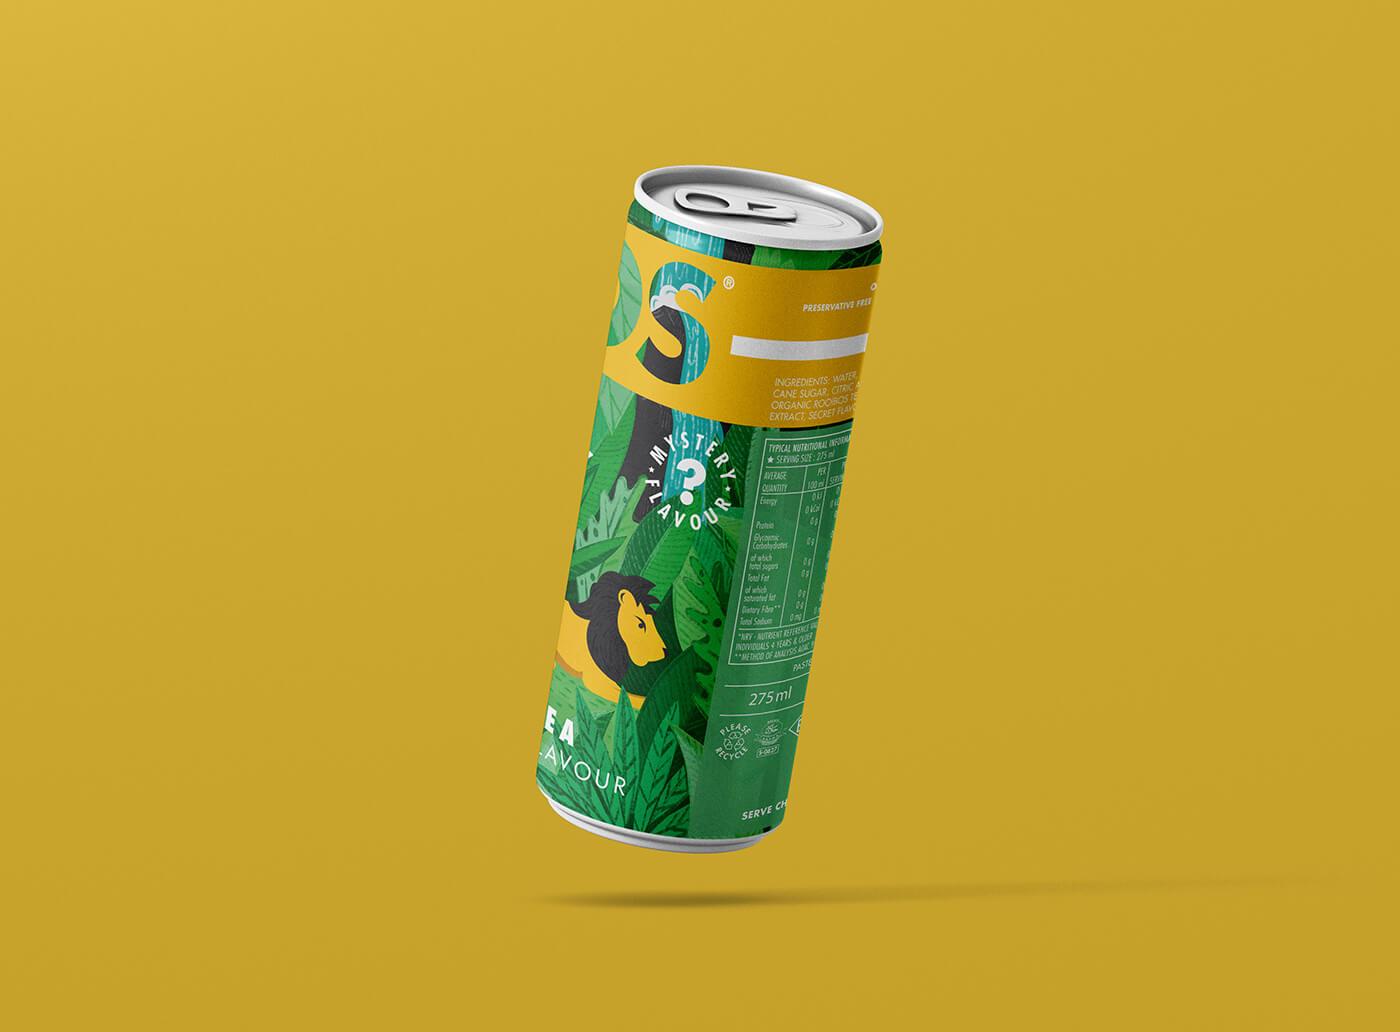 aurora creative studio graphic design illustration cape town portfolio bos ice tea design-a-can